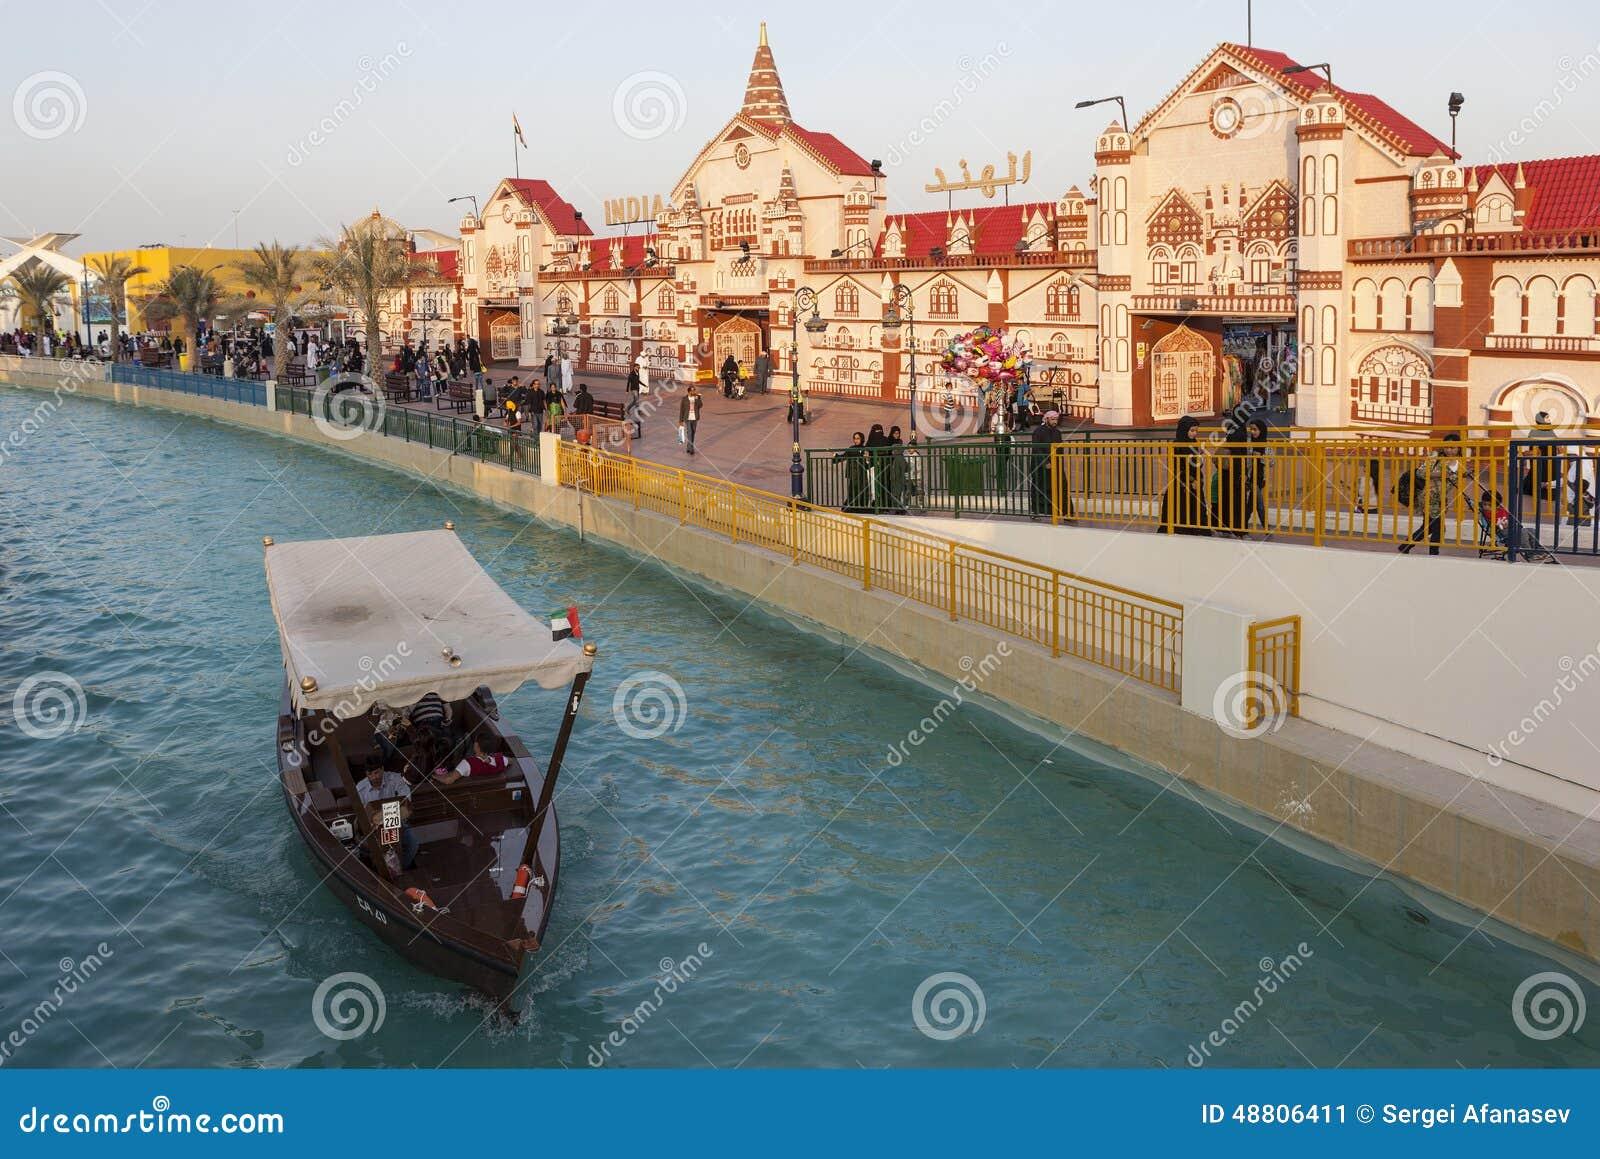 Angemessenes globales Dorf (Weltdorf) dubai United Arab Emirates